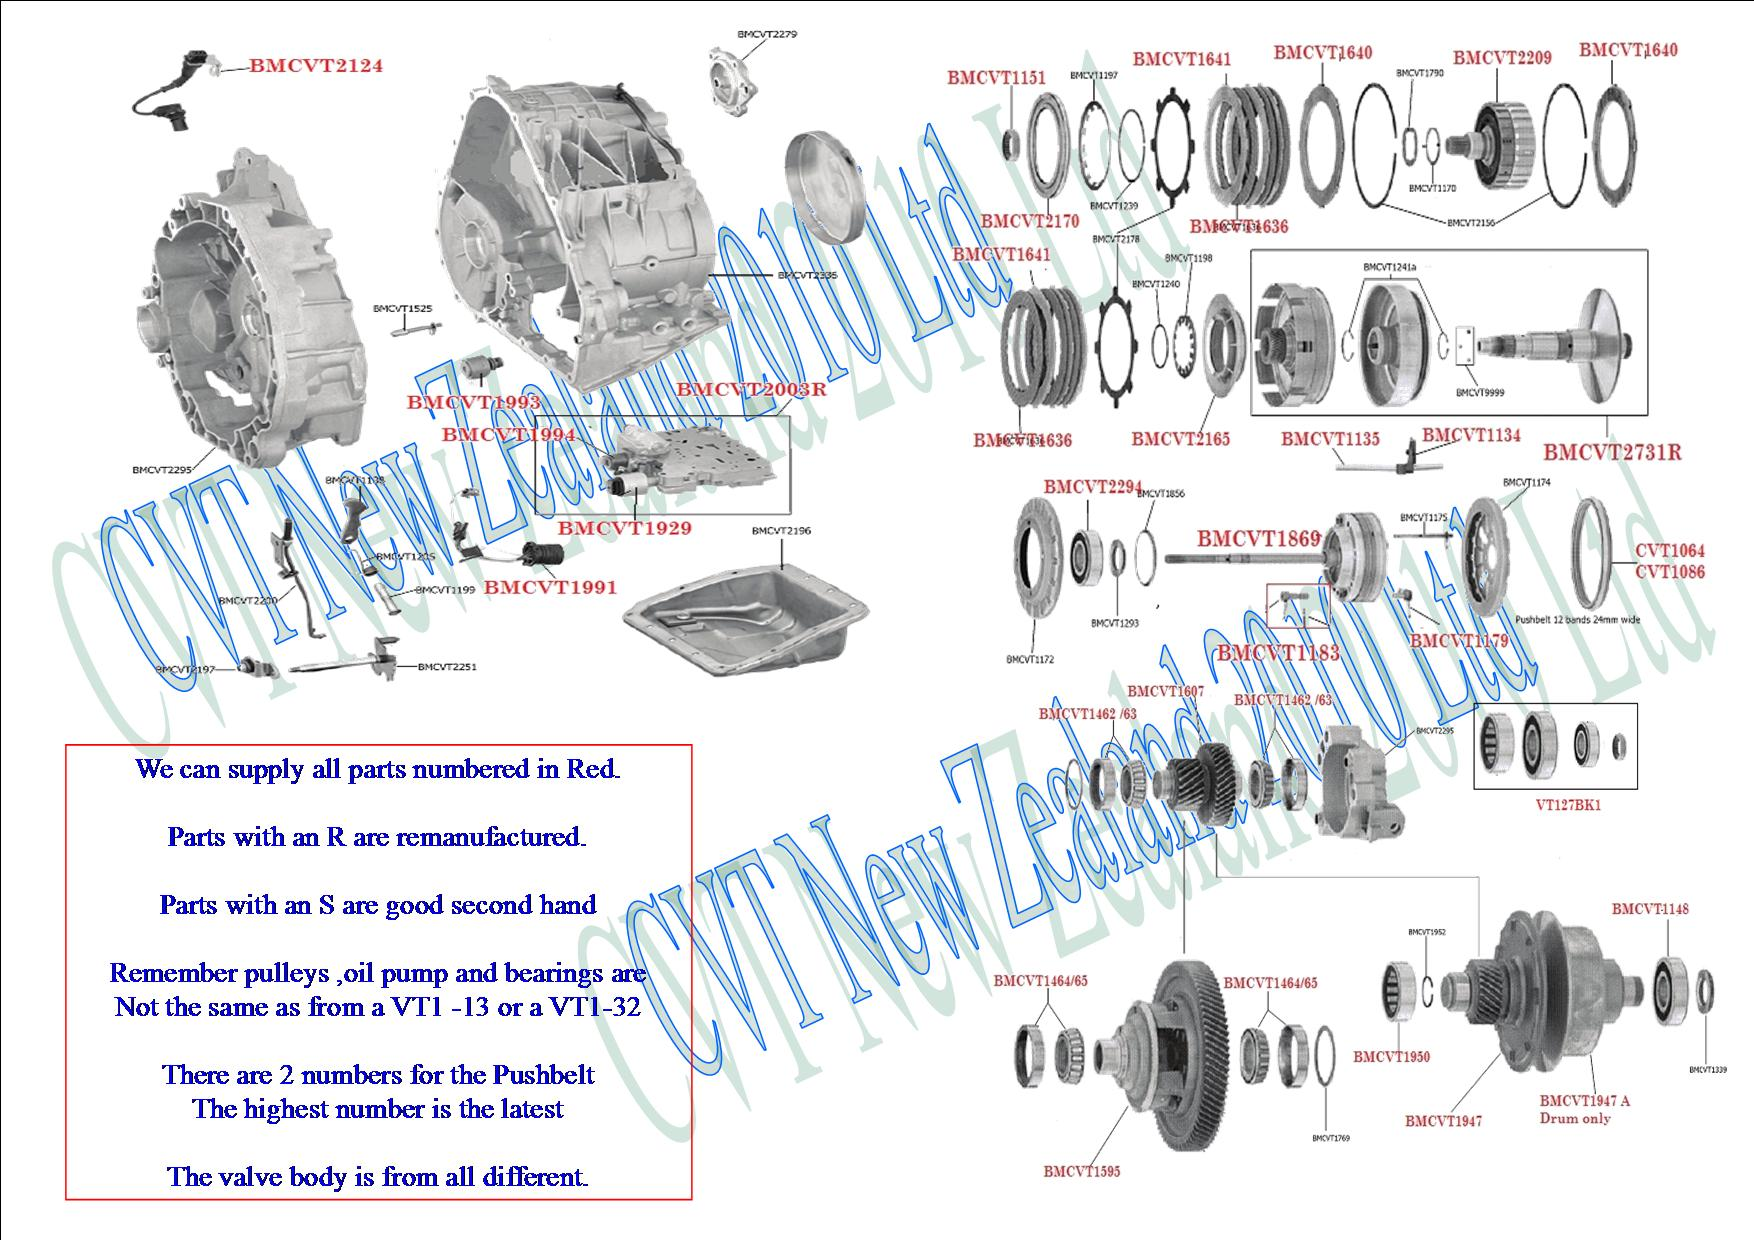 bmw mini cvt transmission vt1 27 cvt transmission cvt parts limited subaru cvt transmission diagram [ 1754 x 1240 Pixel ]